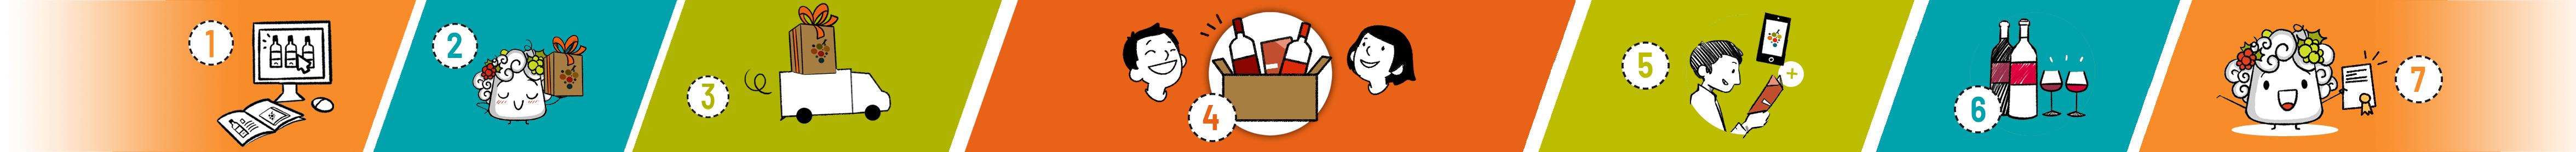 box vin Abacchus - explications en bandeau